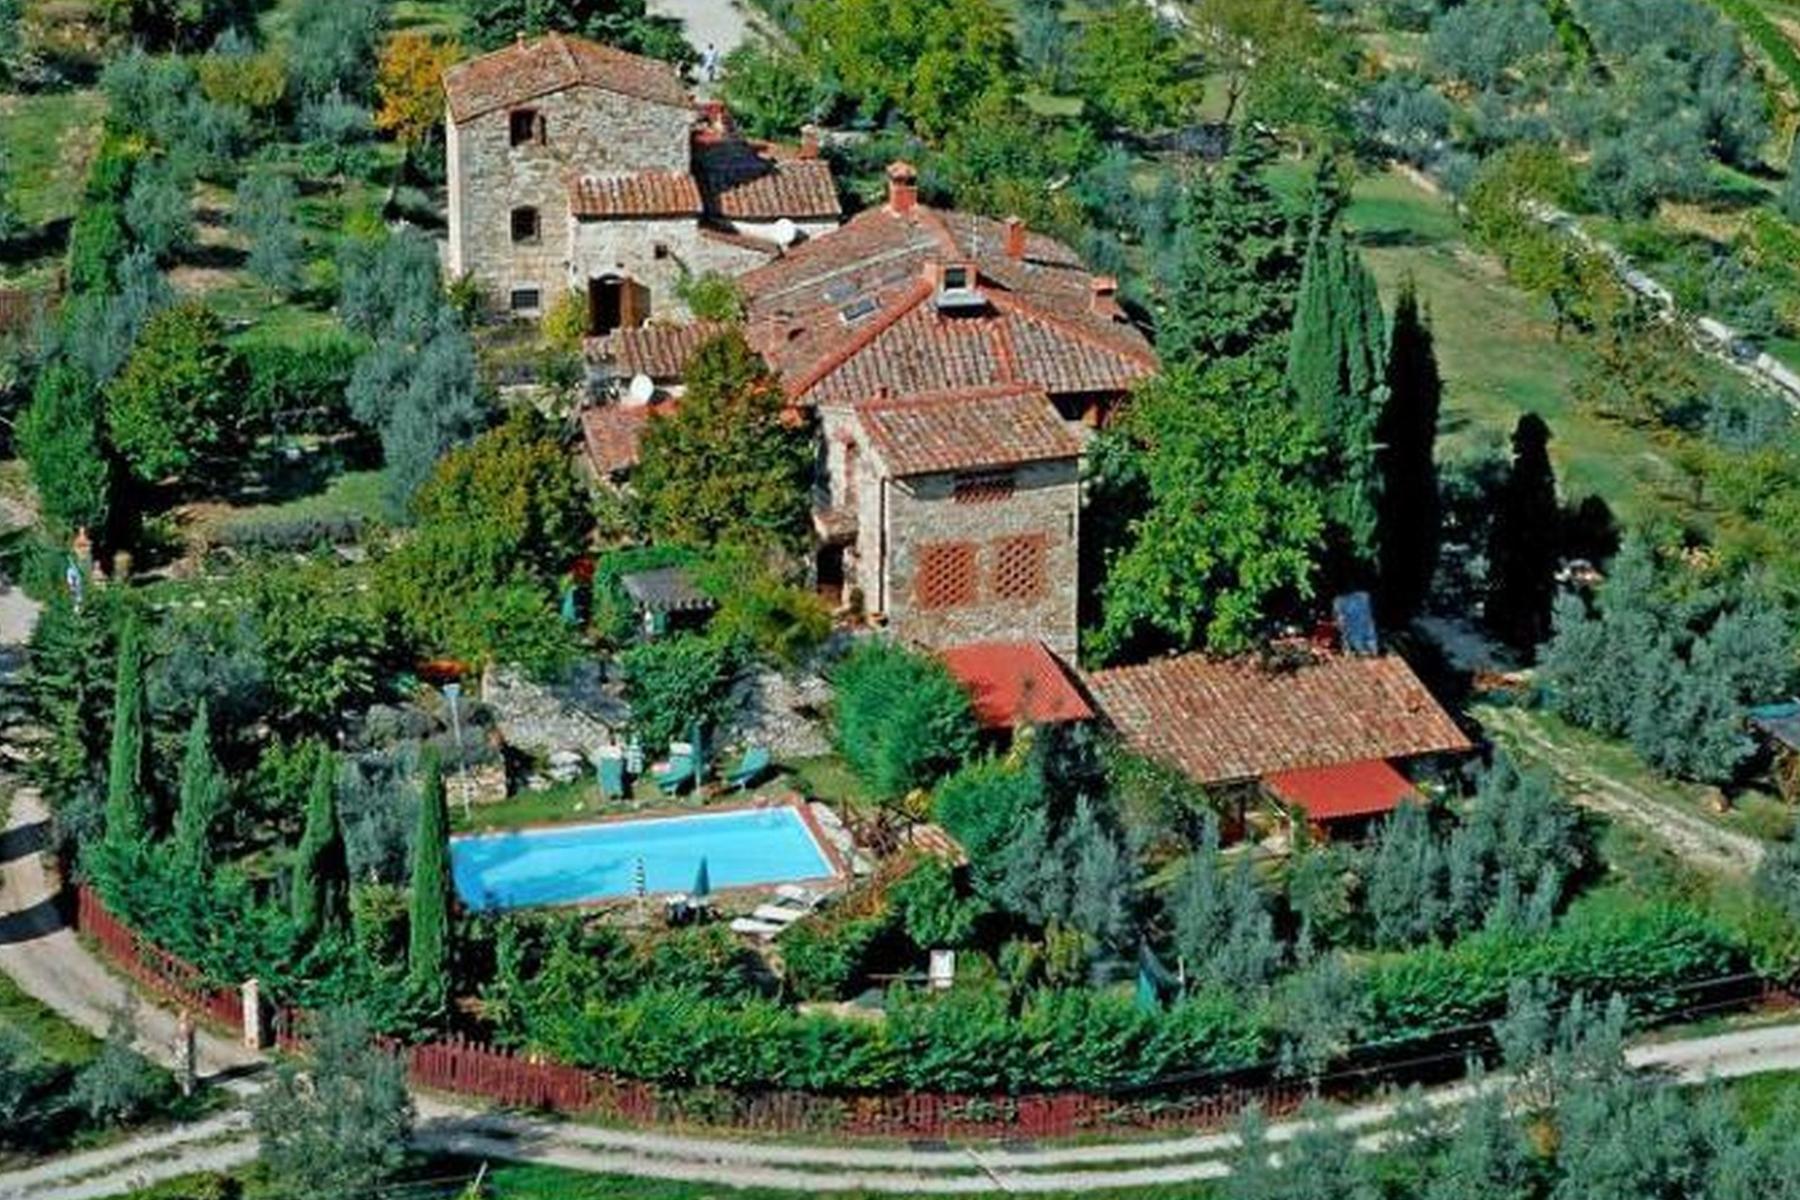 Villa in Vendita a Greve In Chianti: 5 locali, 400 mq - Foto 11